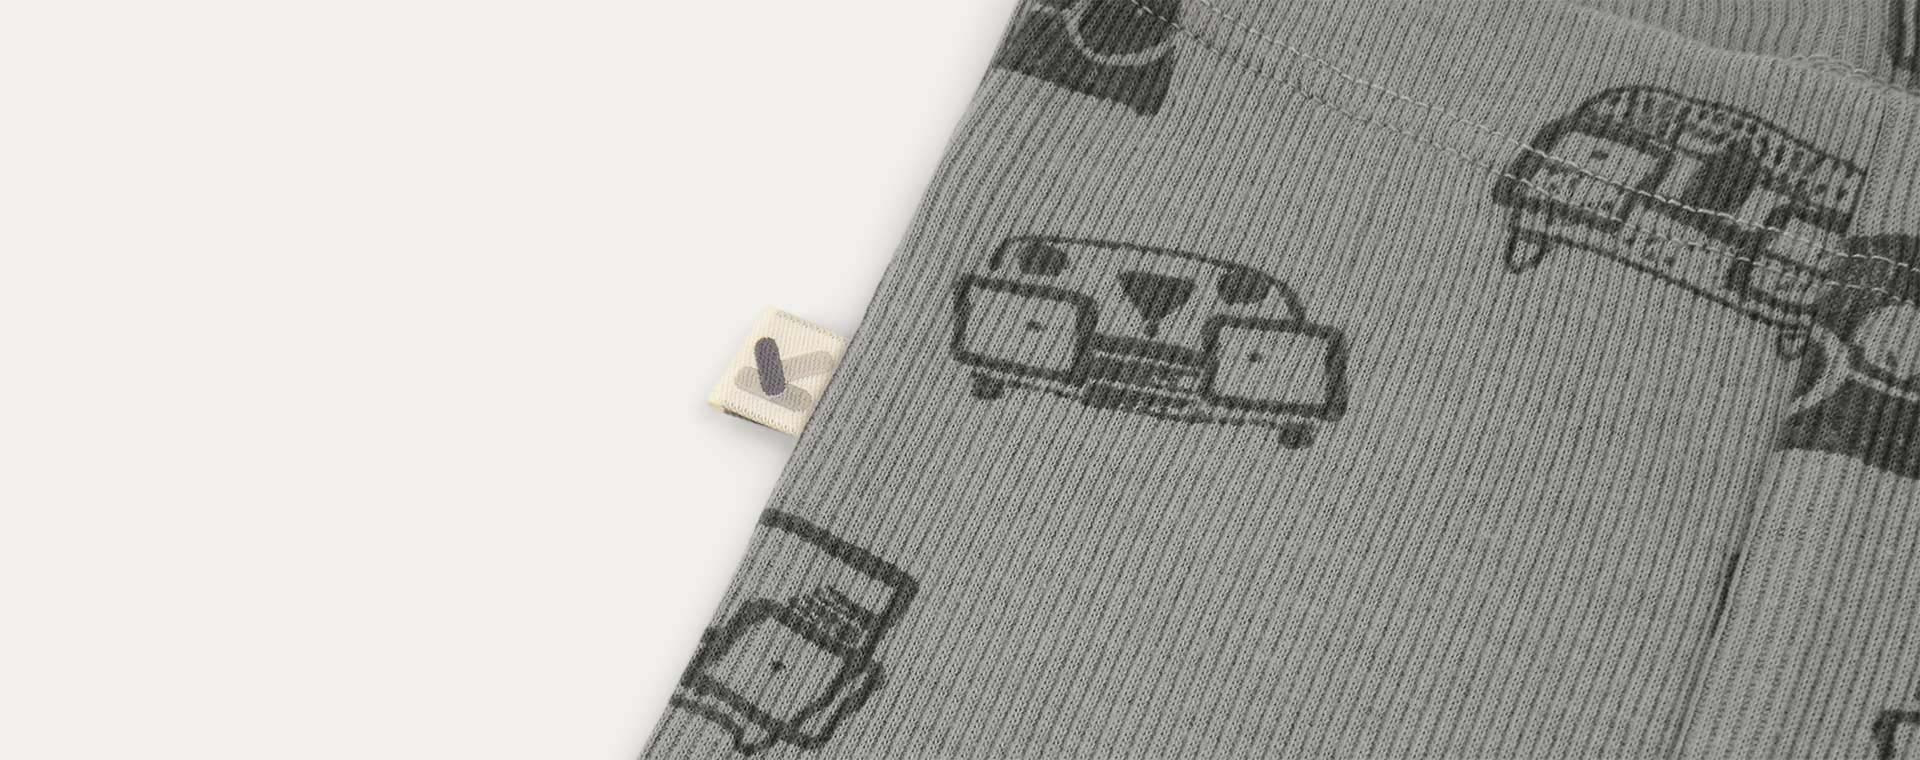 Neutral KIDLY Label Printed Legging